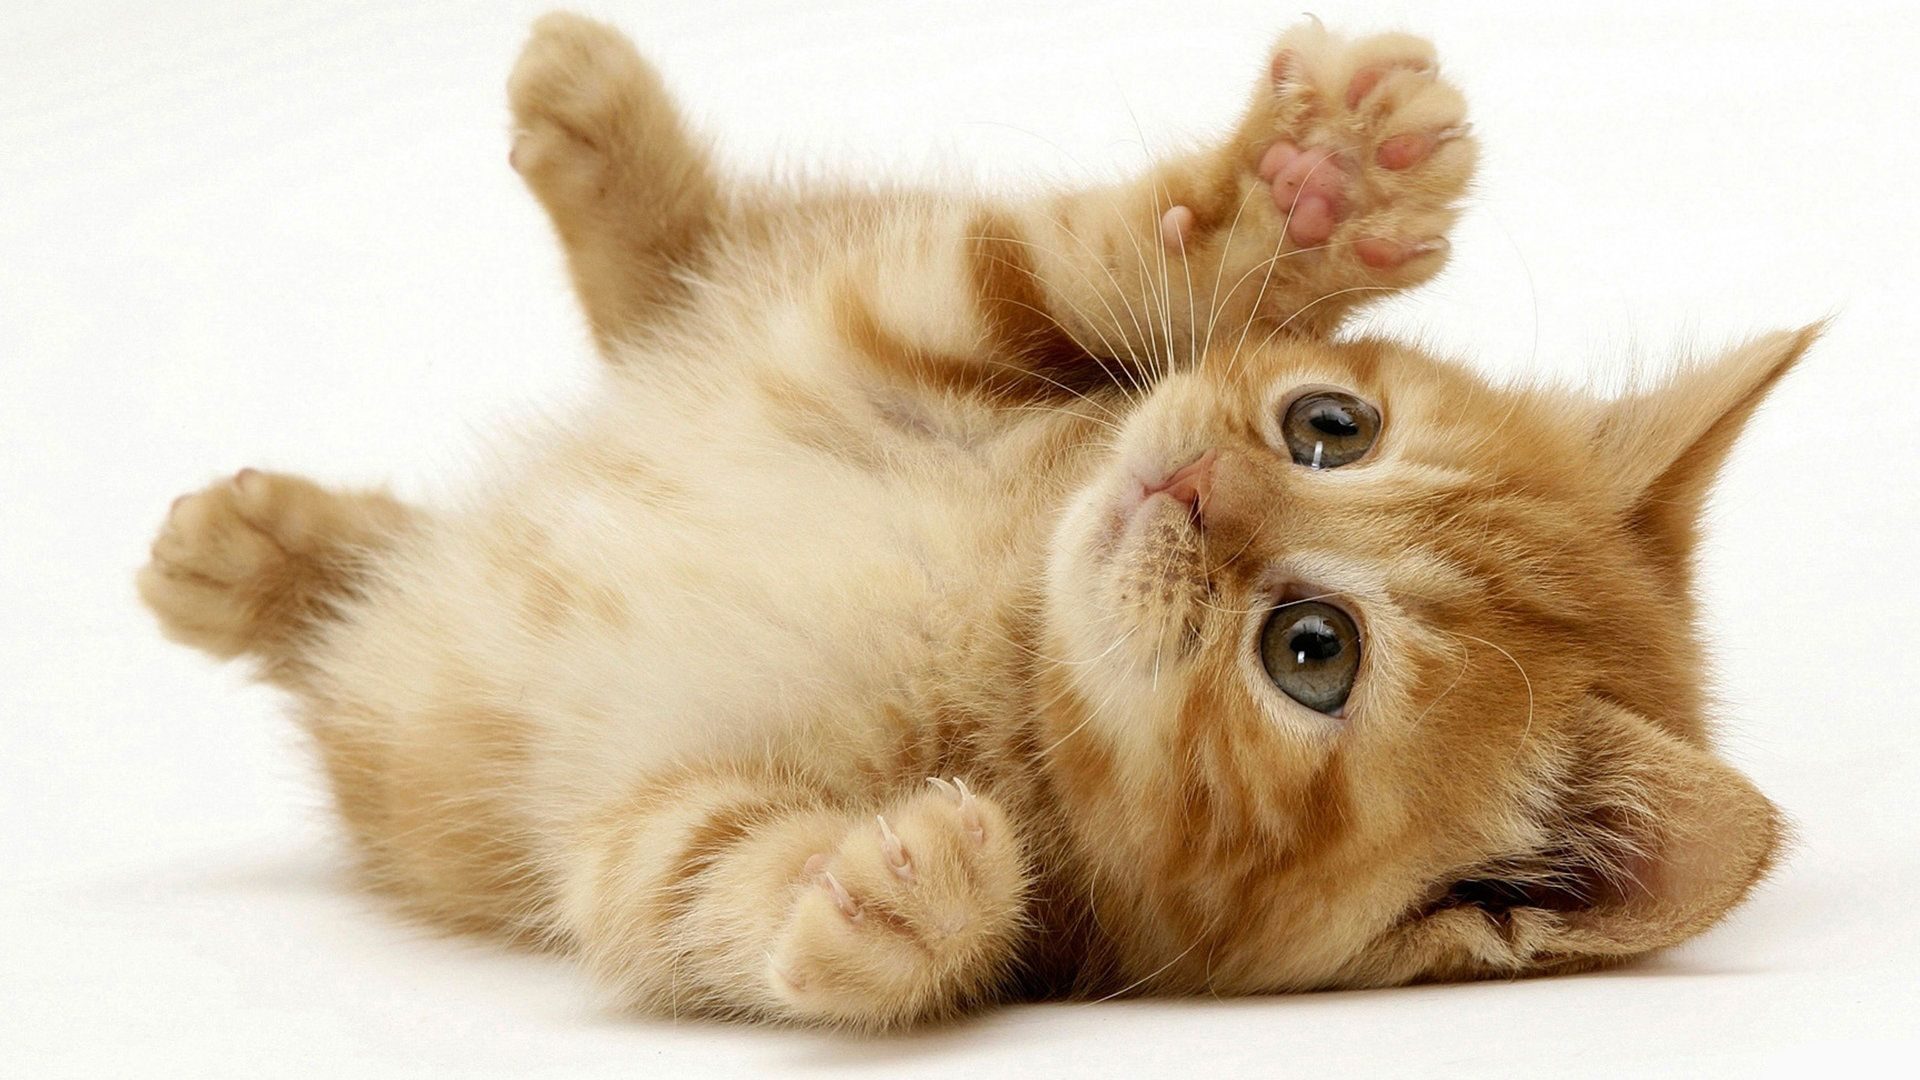 Here S A High Resolution Image Of A Kitten 3 Kittens Cutest Cute Animals Cute Cats